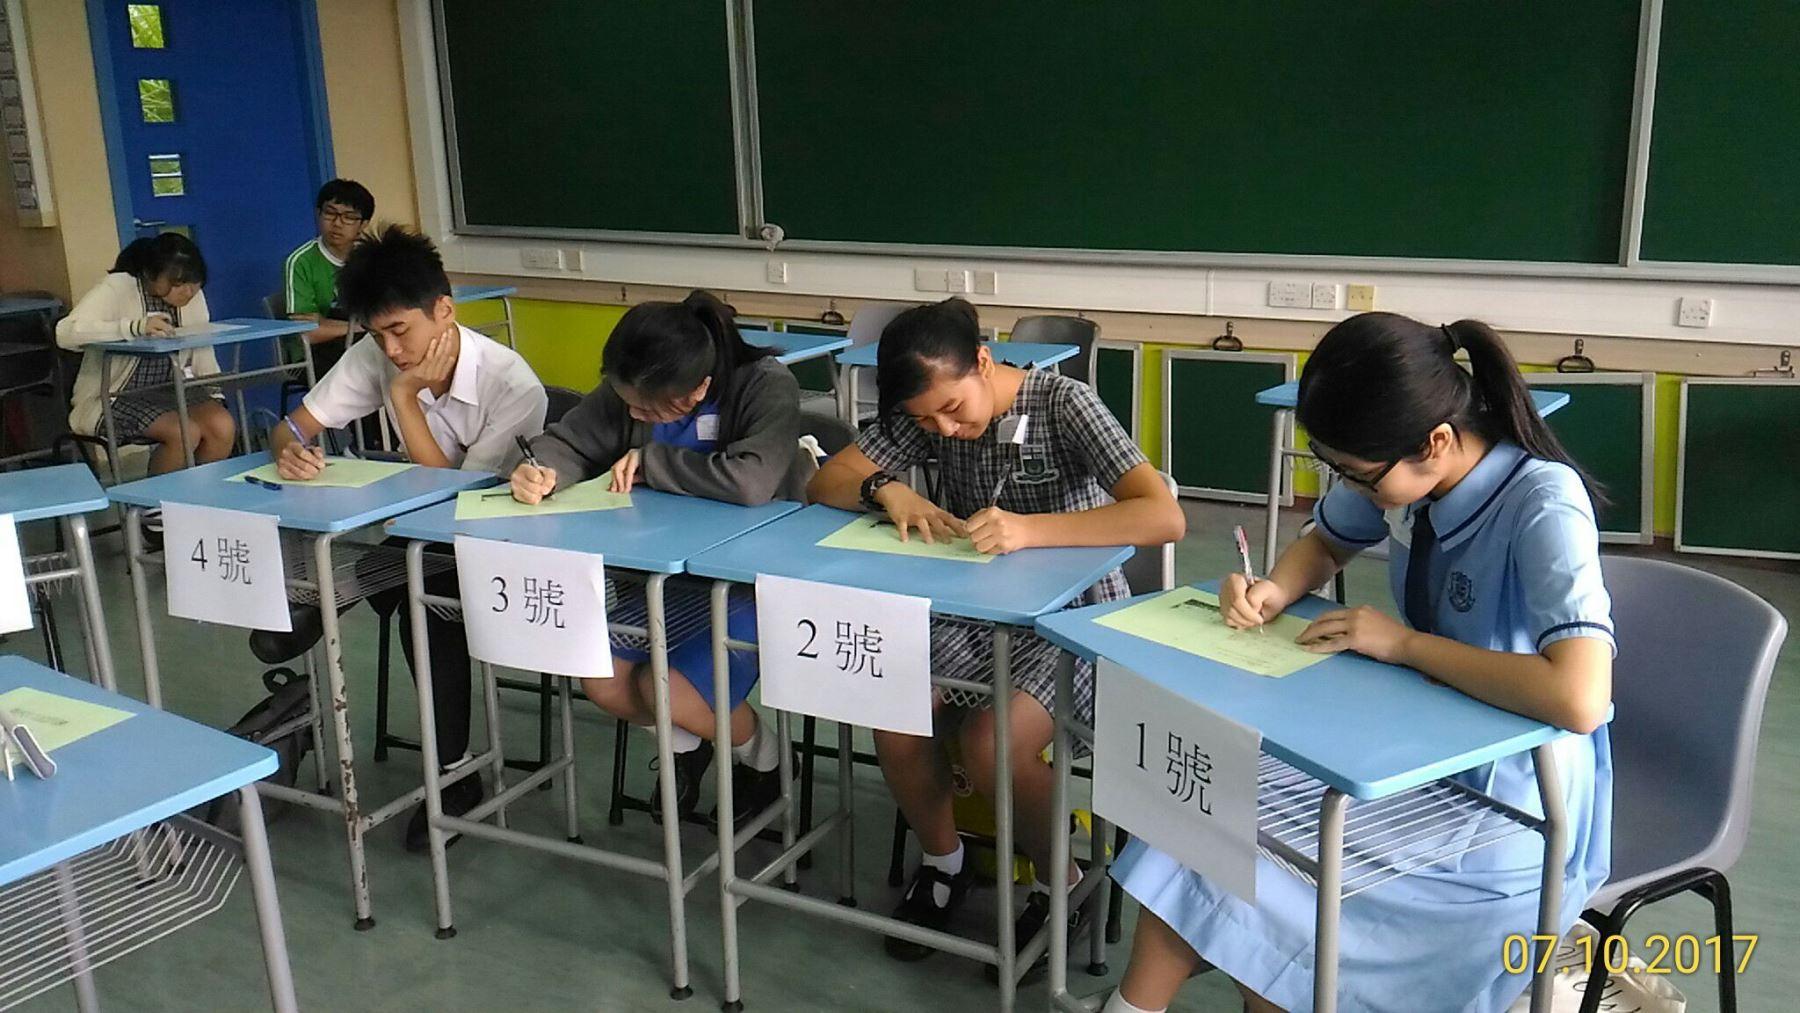 http://npc.edu.hk/sites/default/files/p_20171007_091027_1_p.jpg